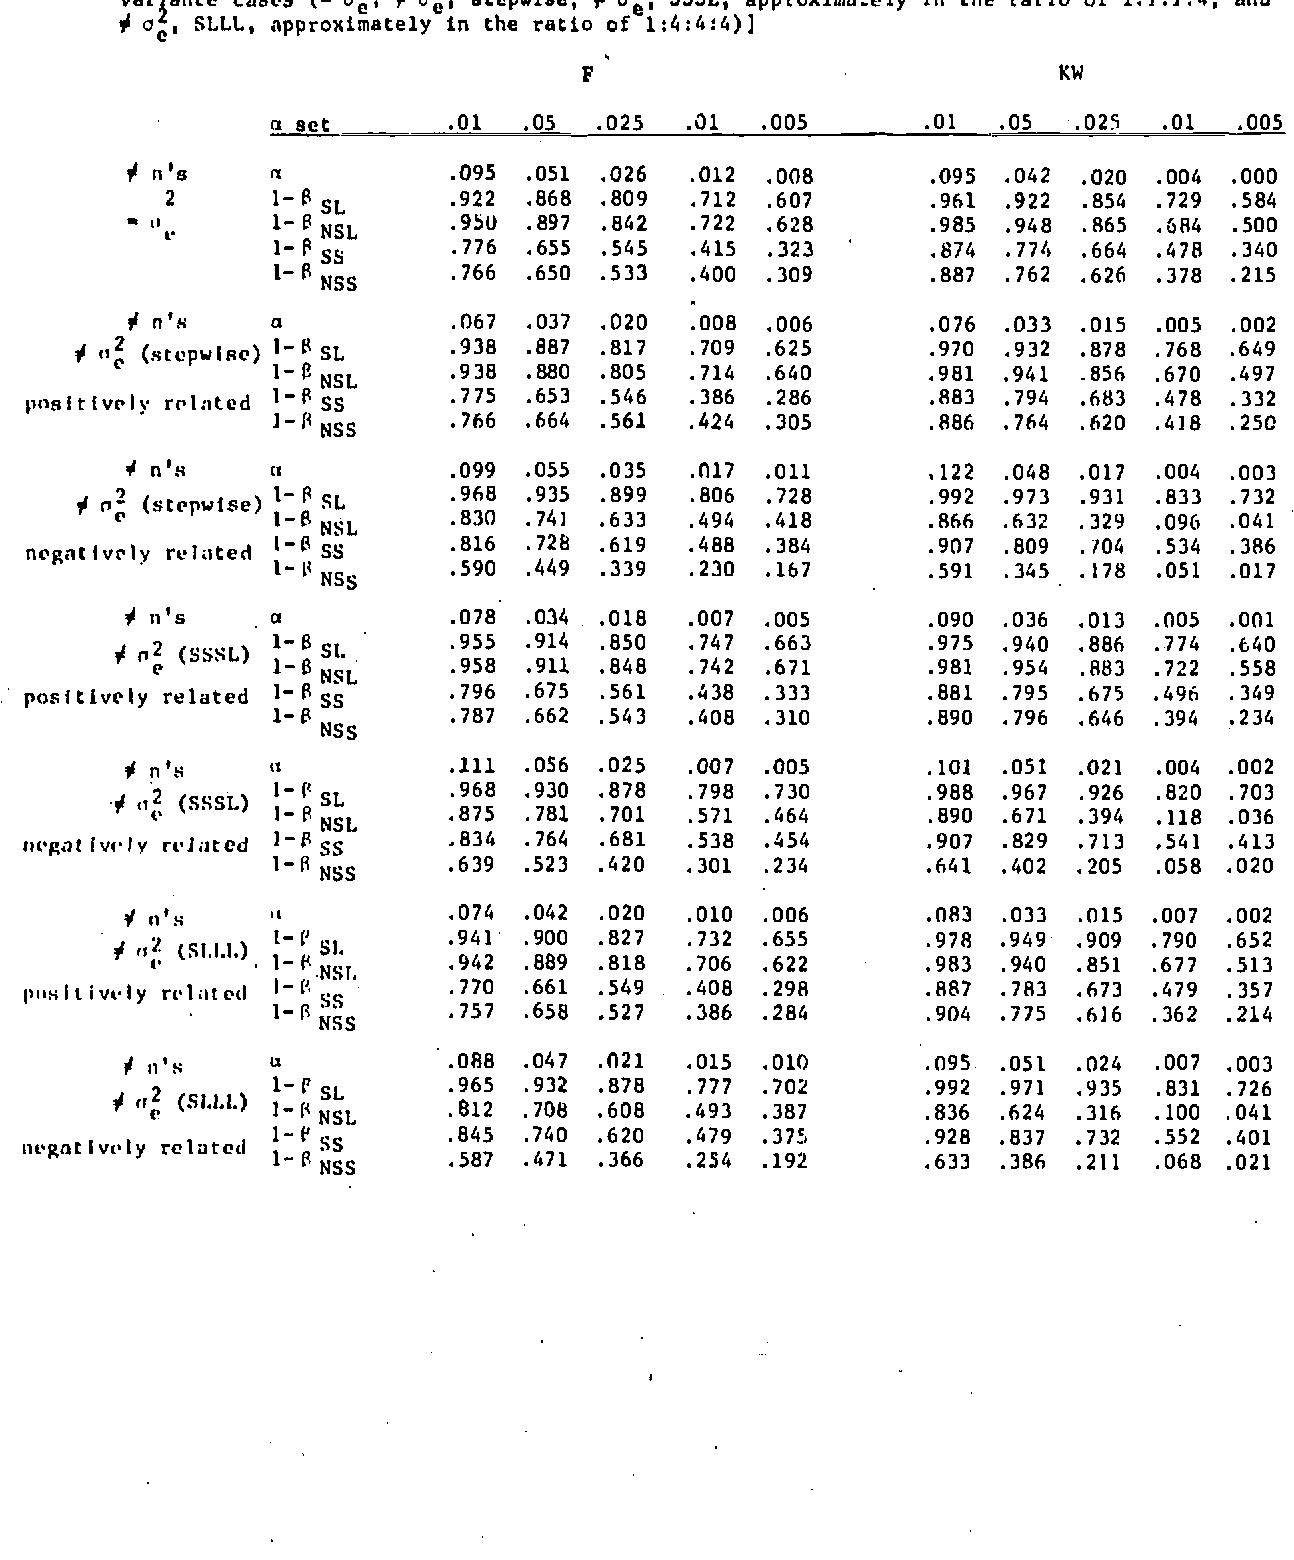 Pdf The Anova F Test Versus The Kruskal Wallis Test A Robustness